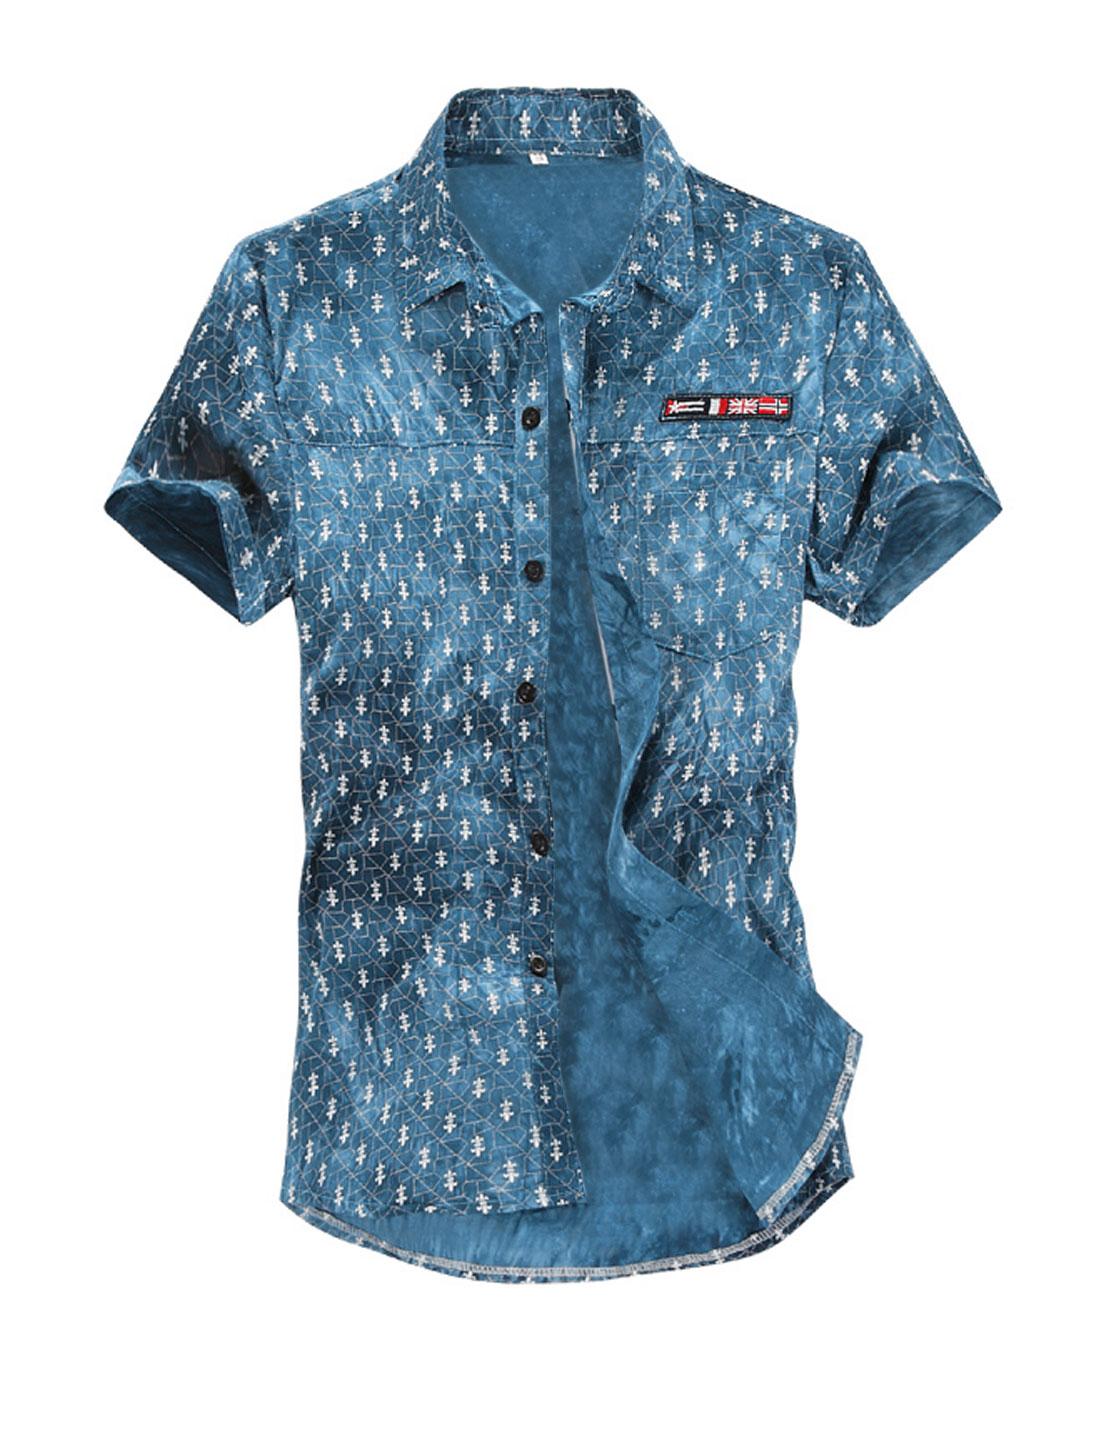 Men Button Up Novelty Print Short Sleeve Point Collar Casual Shirts Navy Blue M